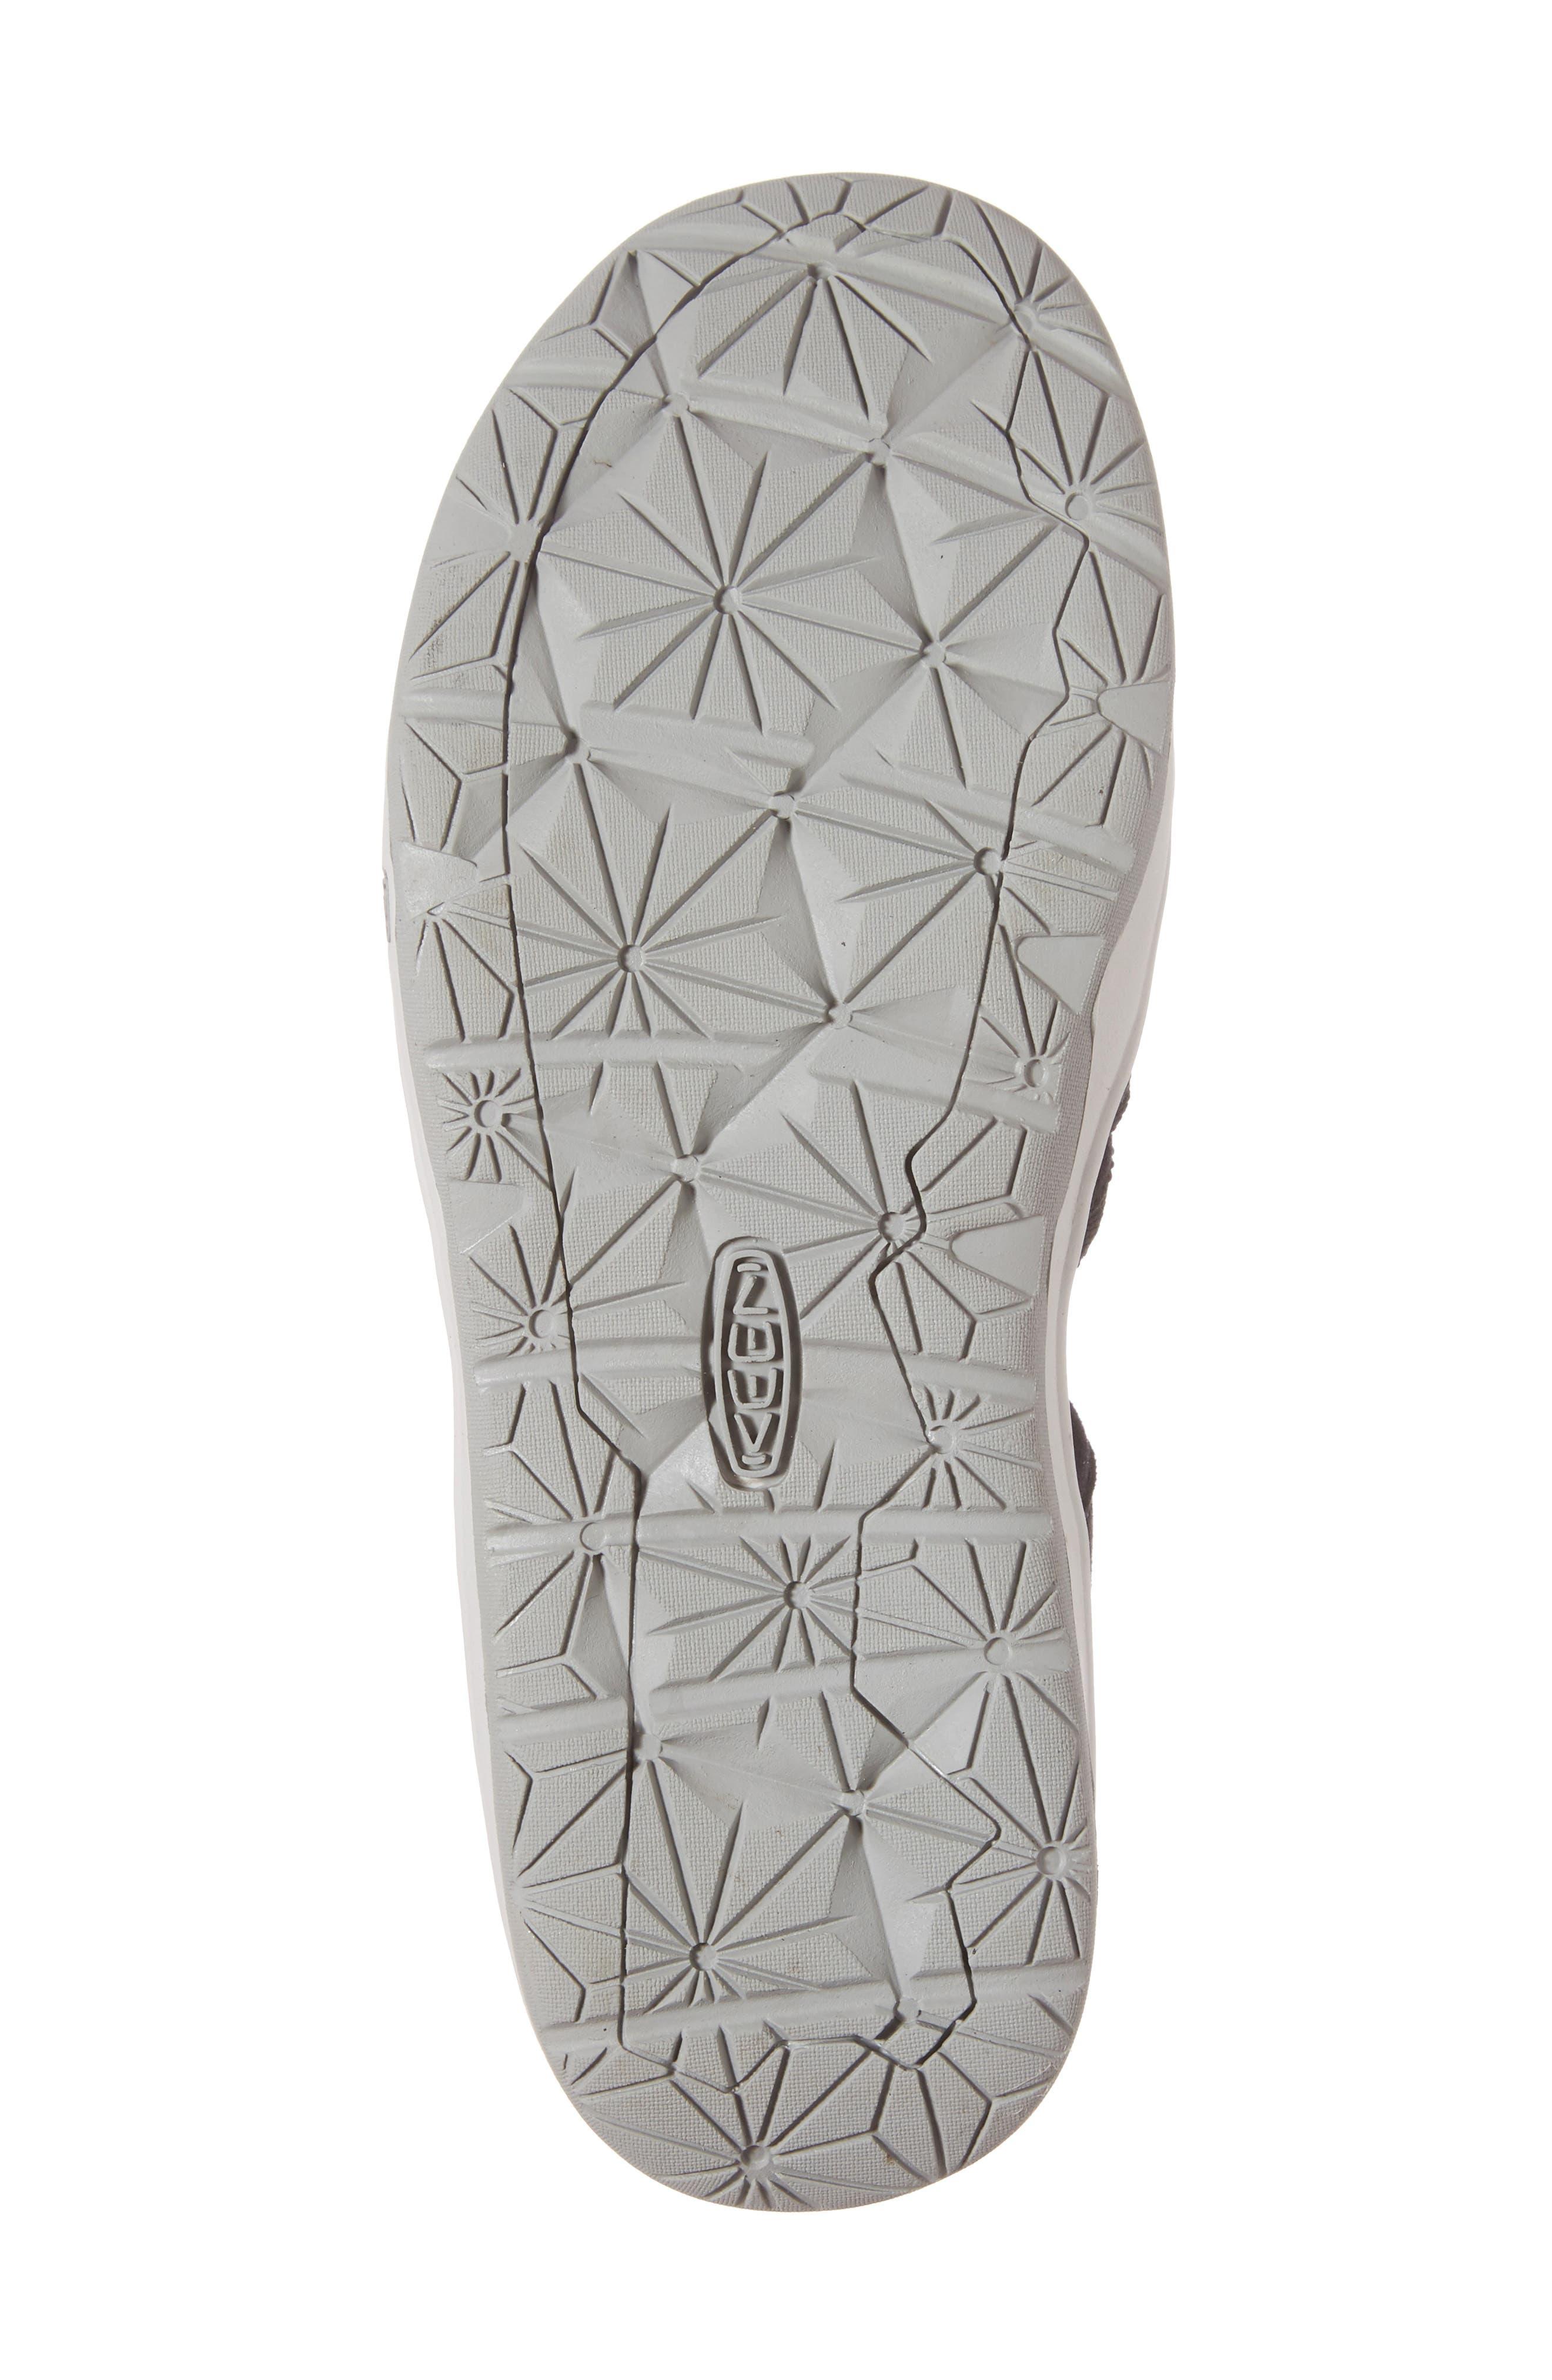 KEEN, Moxie Water Friendly Sandal, Alternate thumbnail 6, color, BLACK/ VAPOR